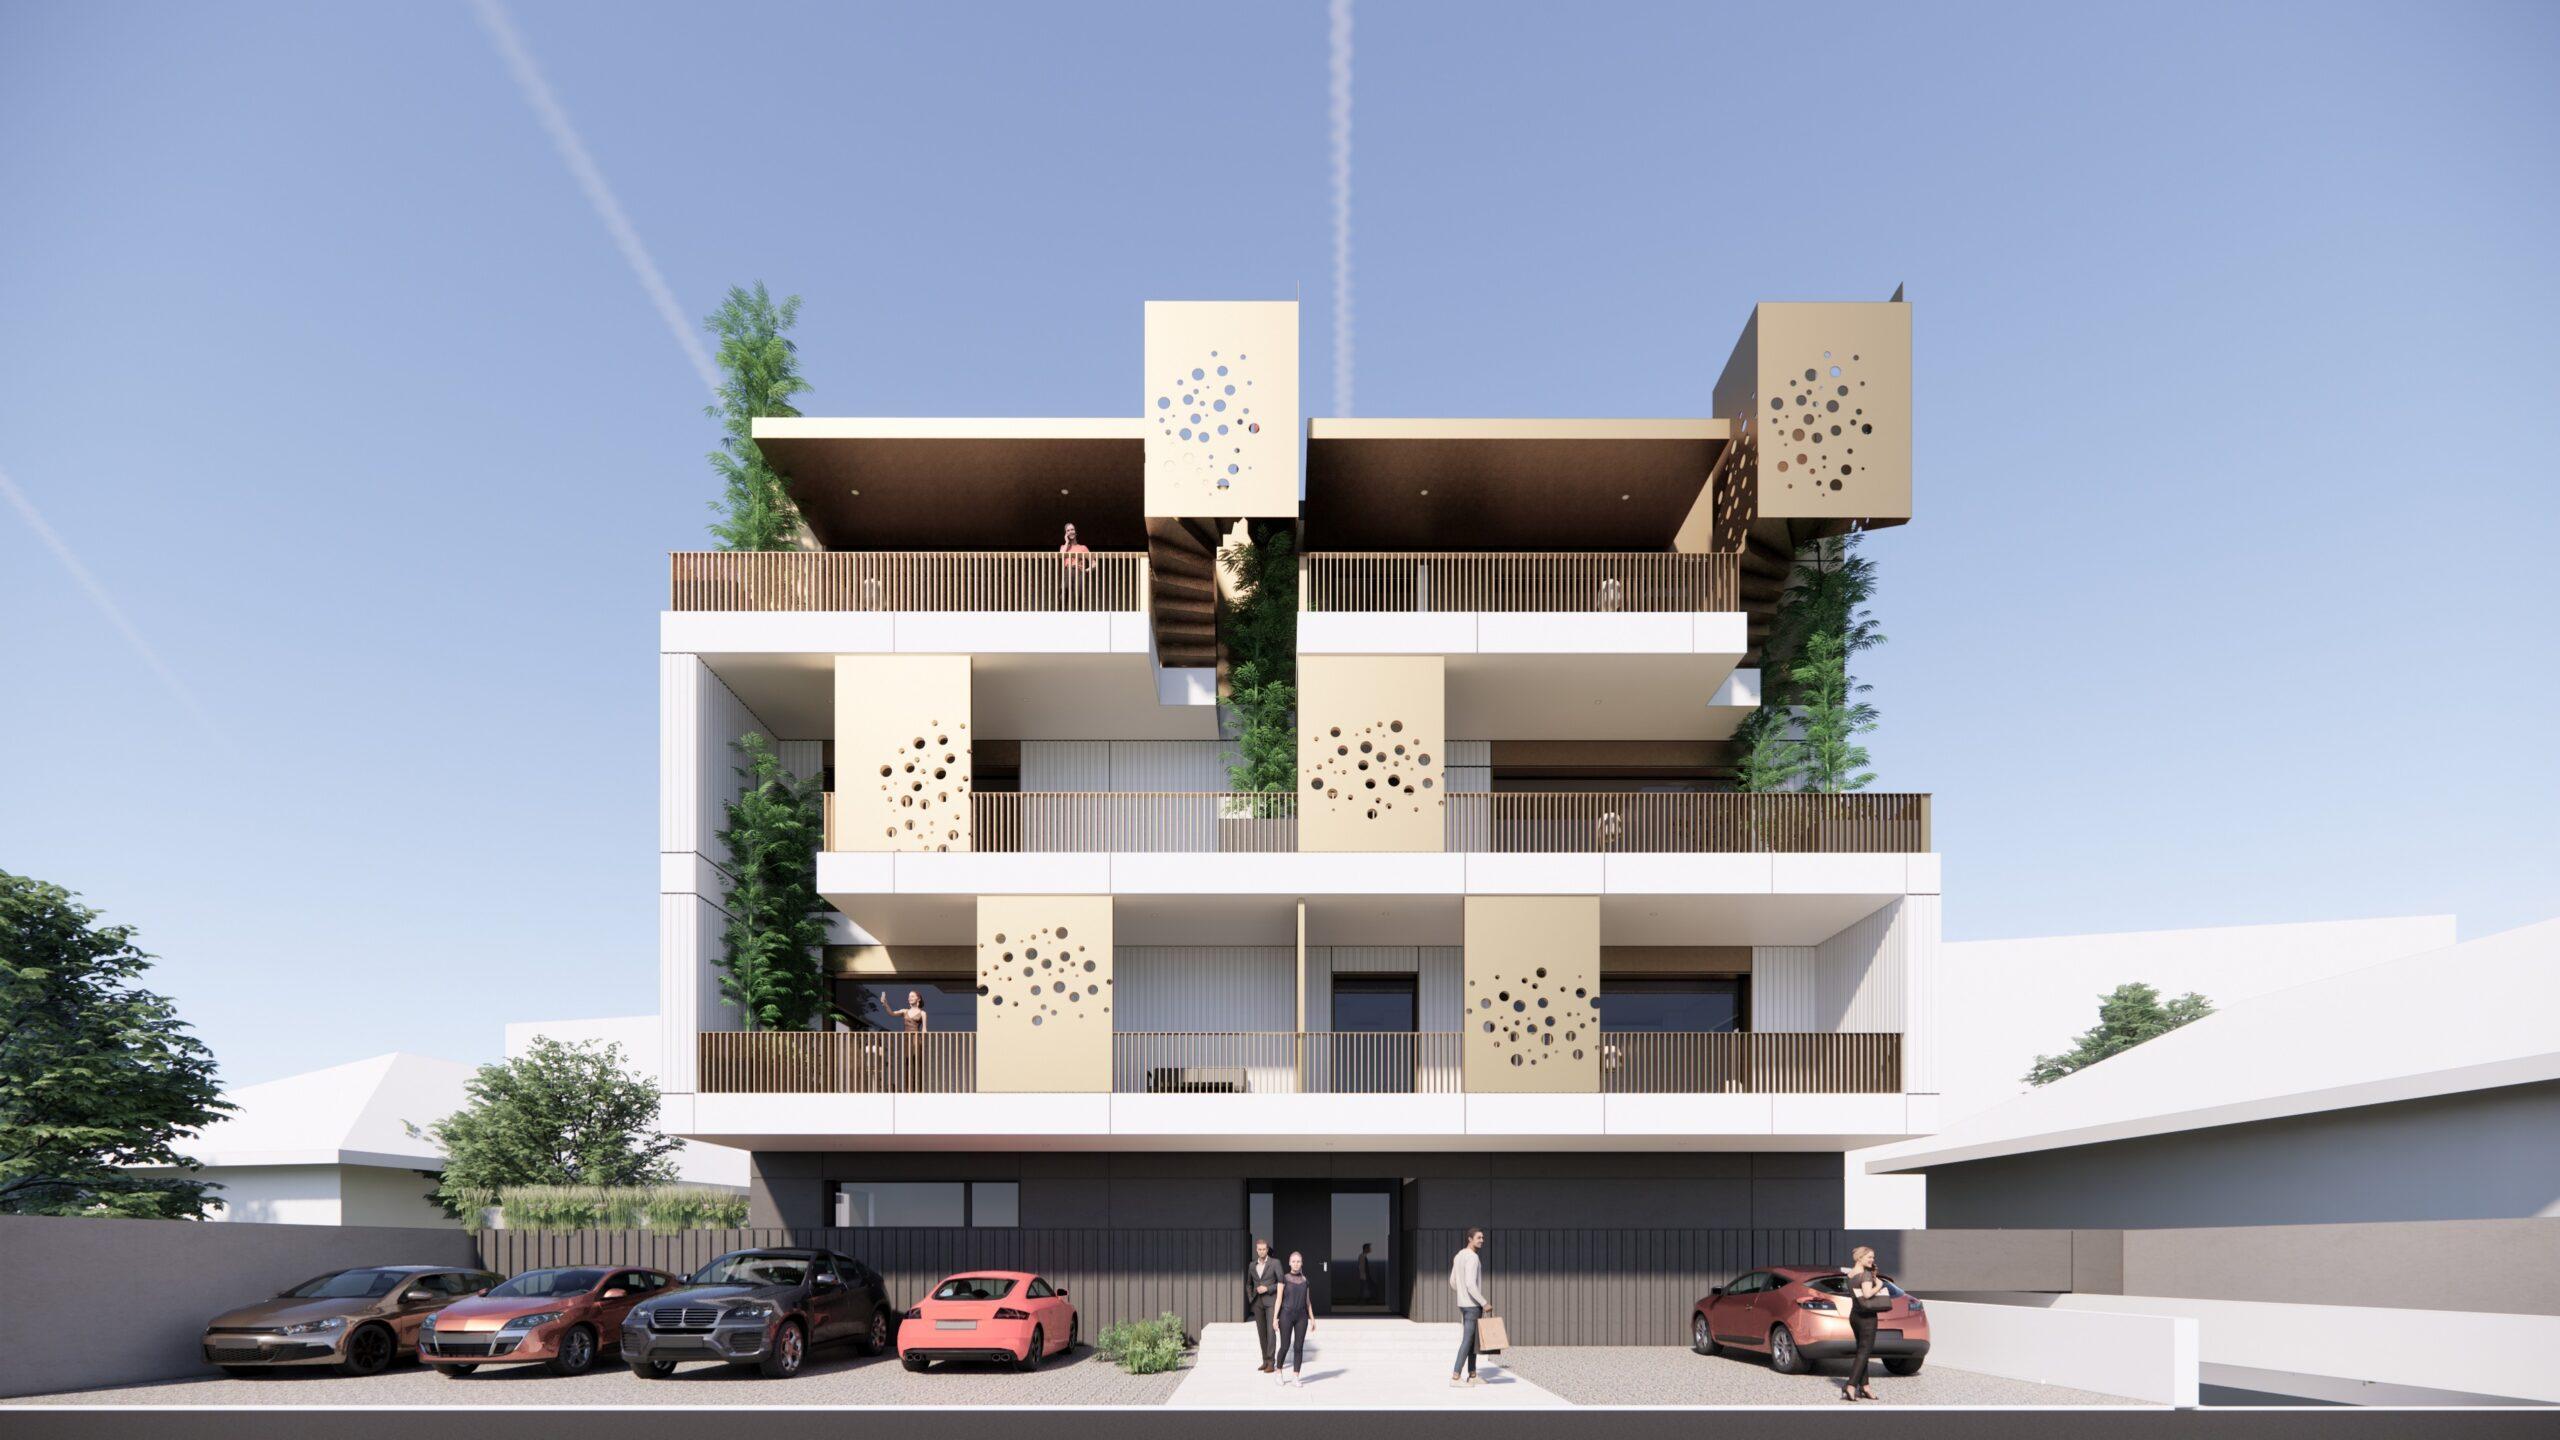 https://nbc-arhitect.ro/wp-content/uploads/2021/09/Jandarmeriei-2-scaled.jpg